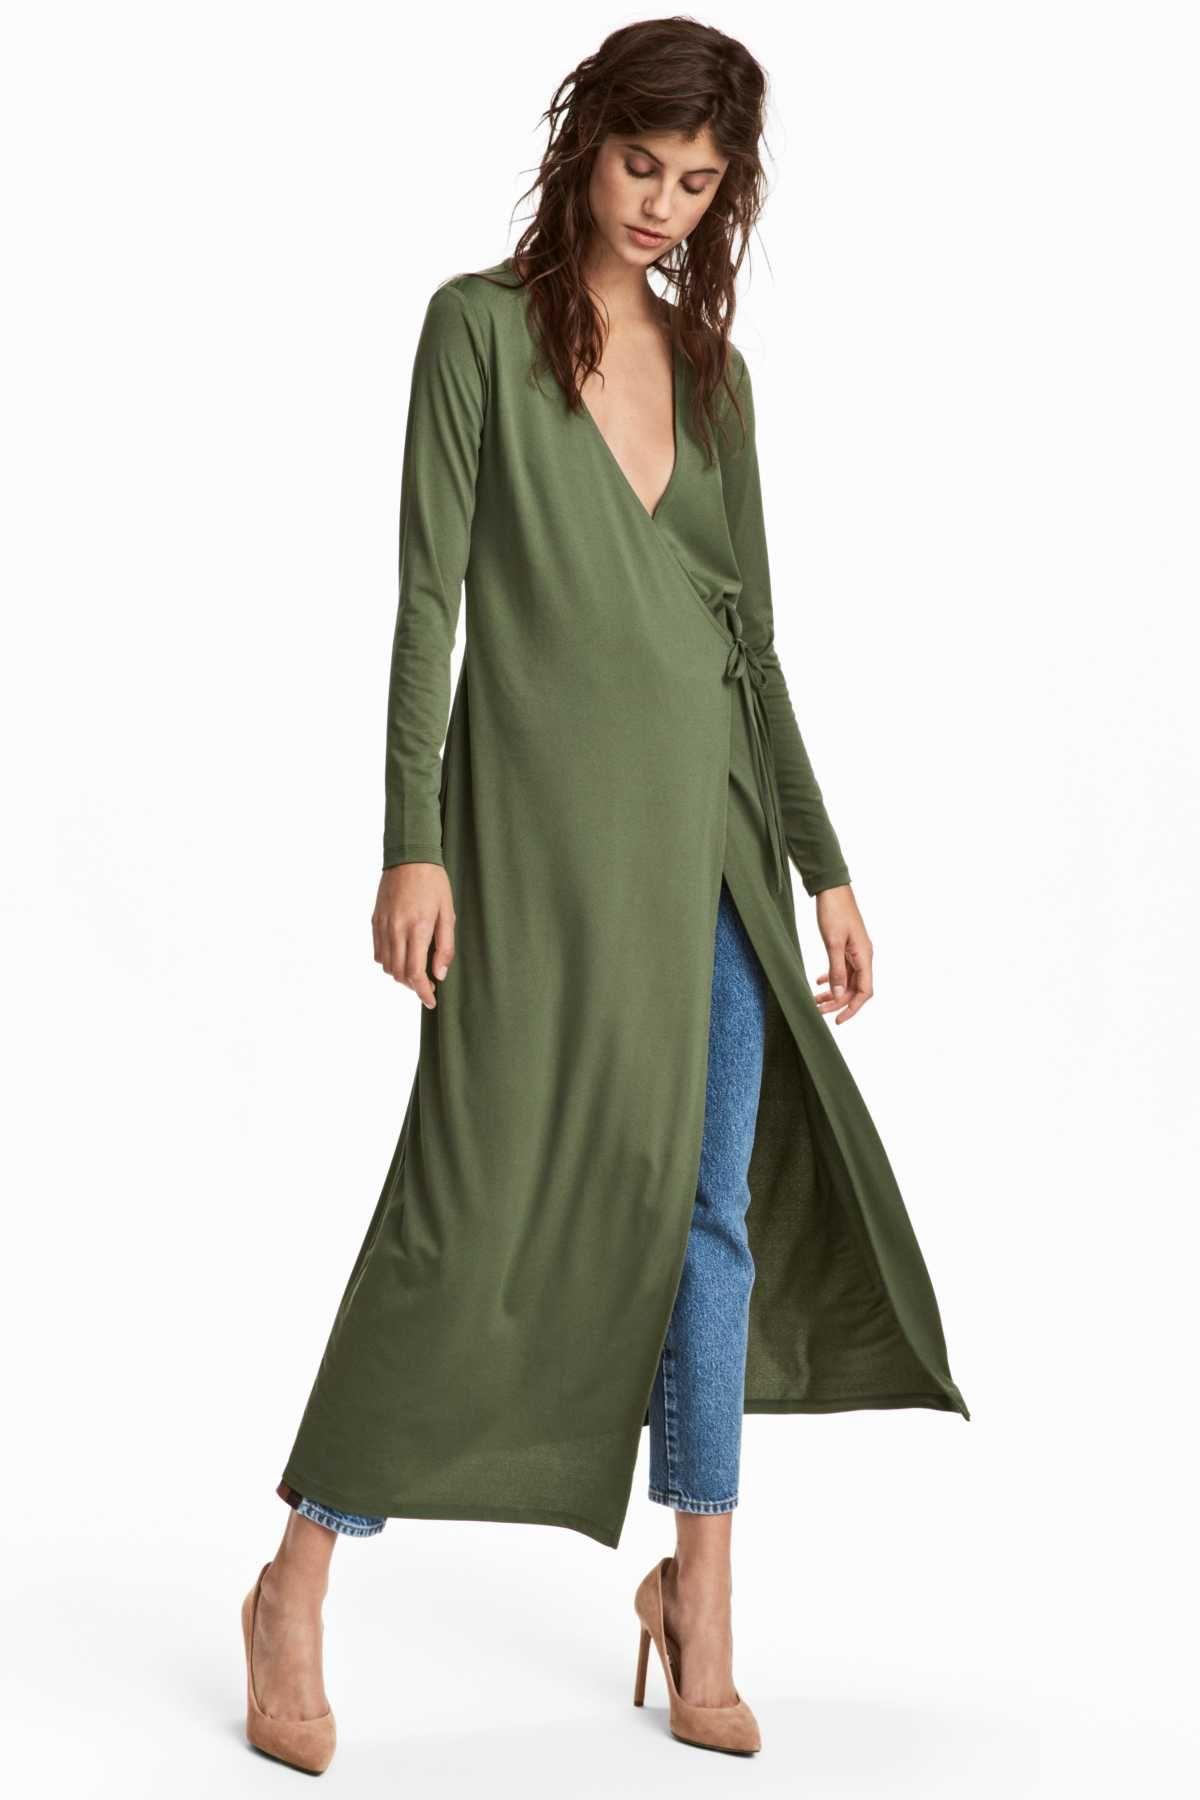 a249728d4 Khaki green. Long wrap dress in crêped jersey. V-neck